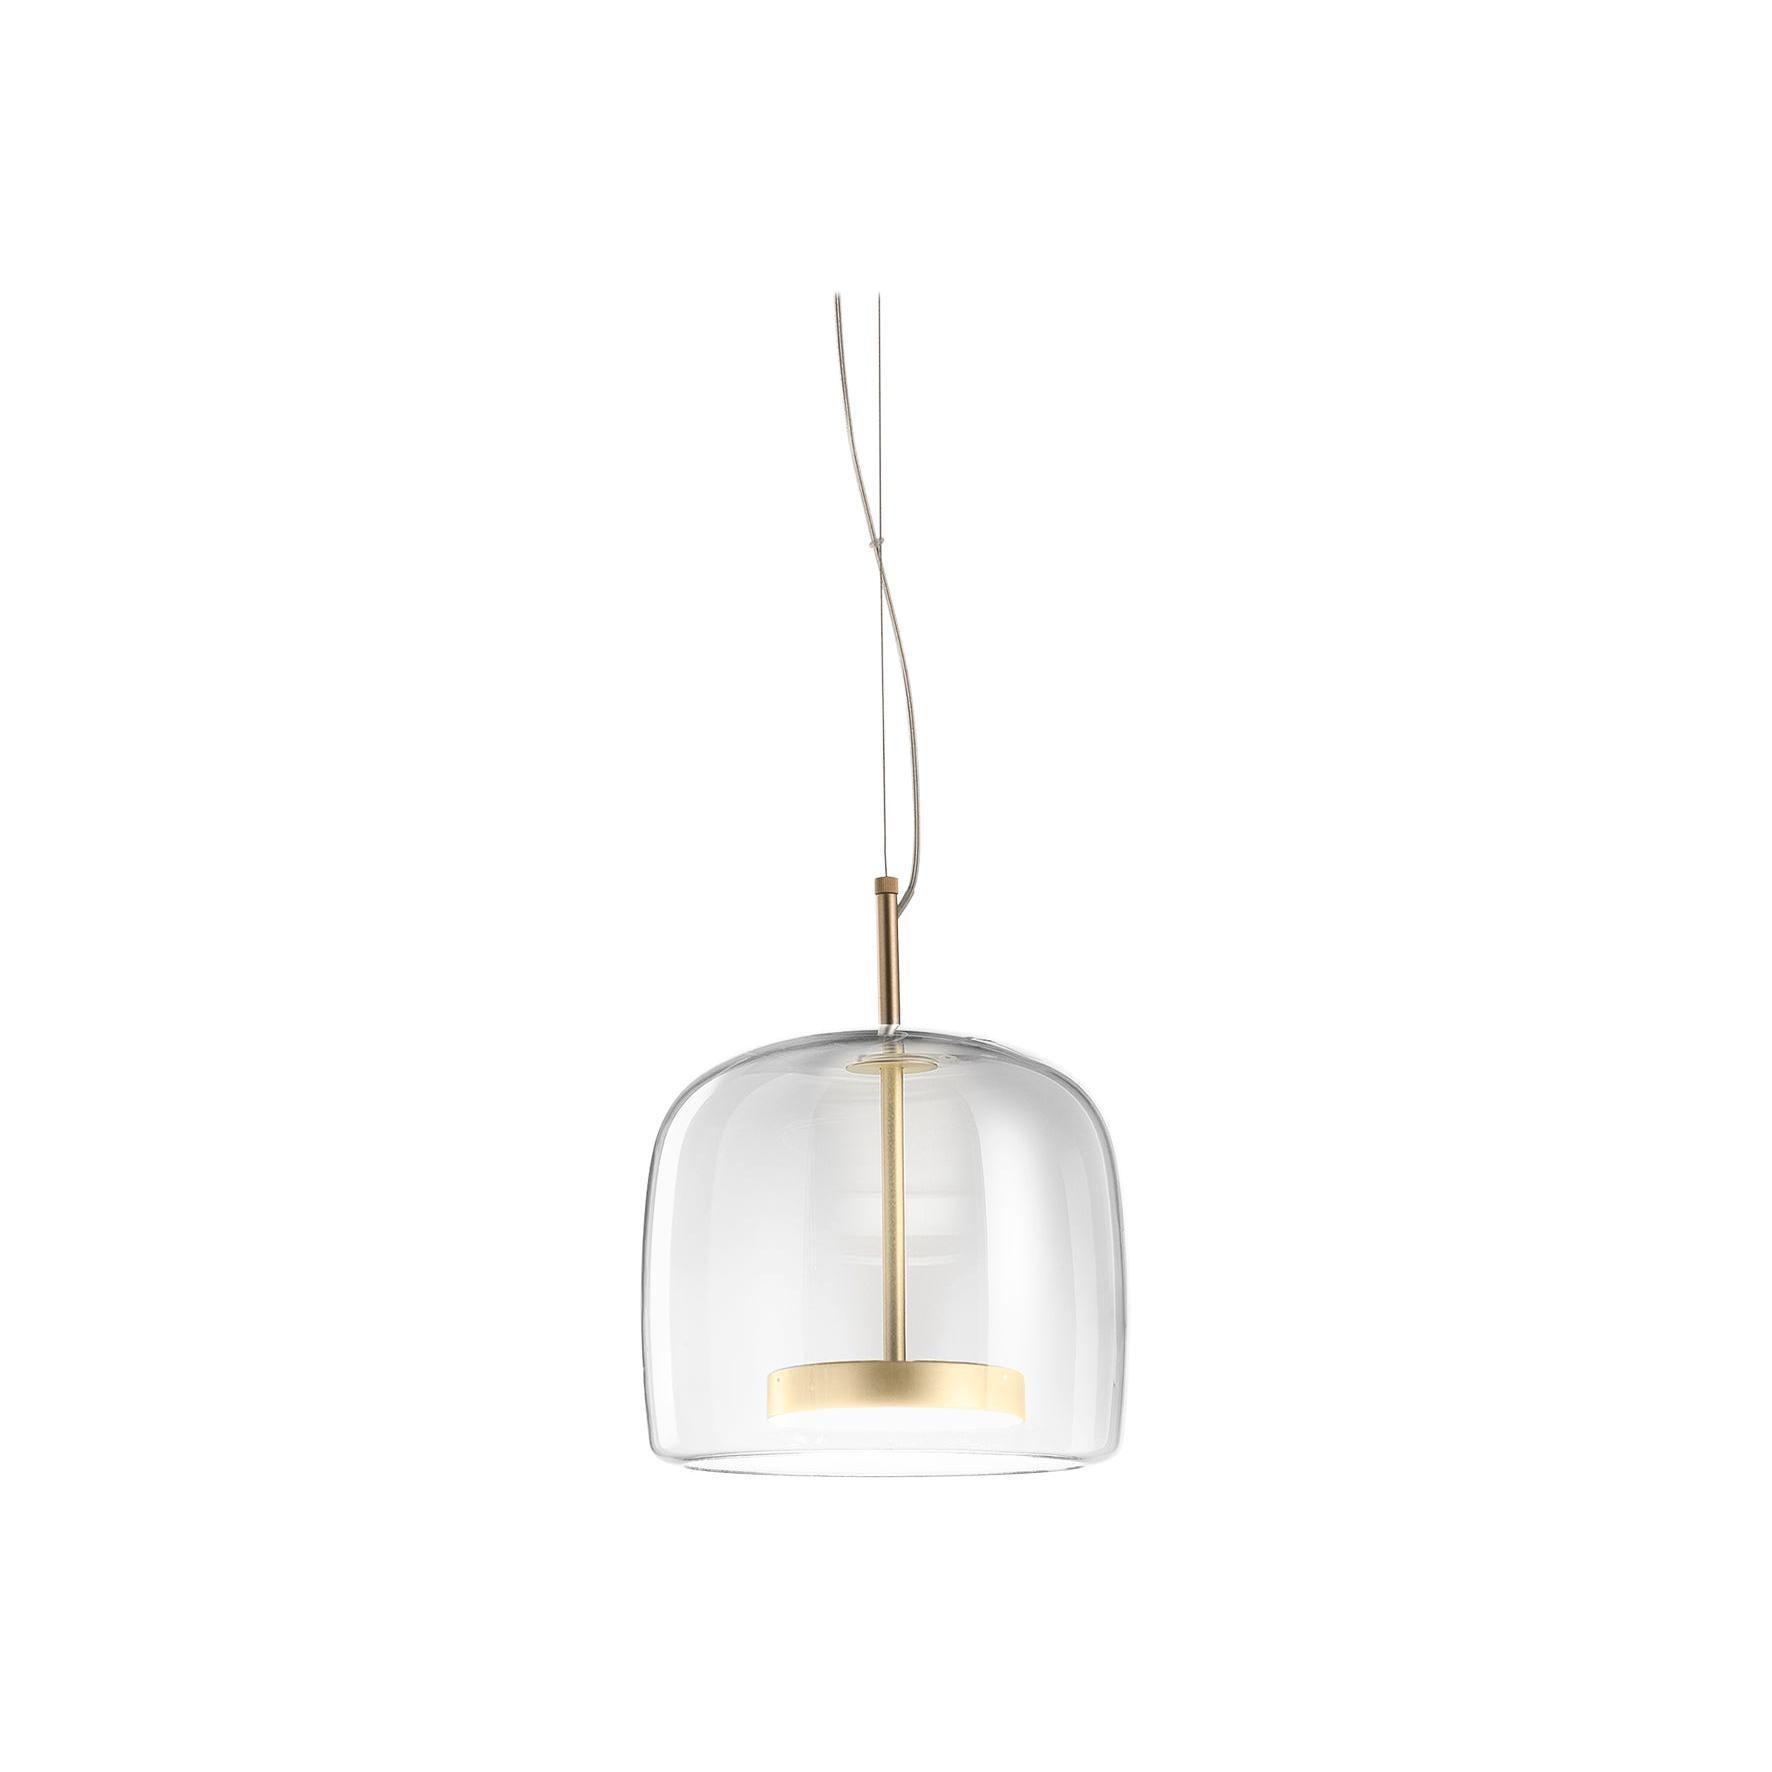 Vistosi Led Jube Sp 1 P Suspension Light by Favaretto&Partners